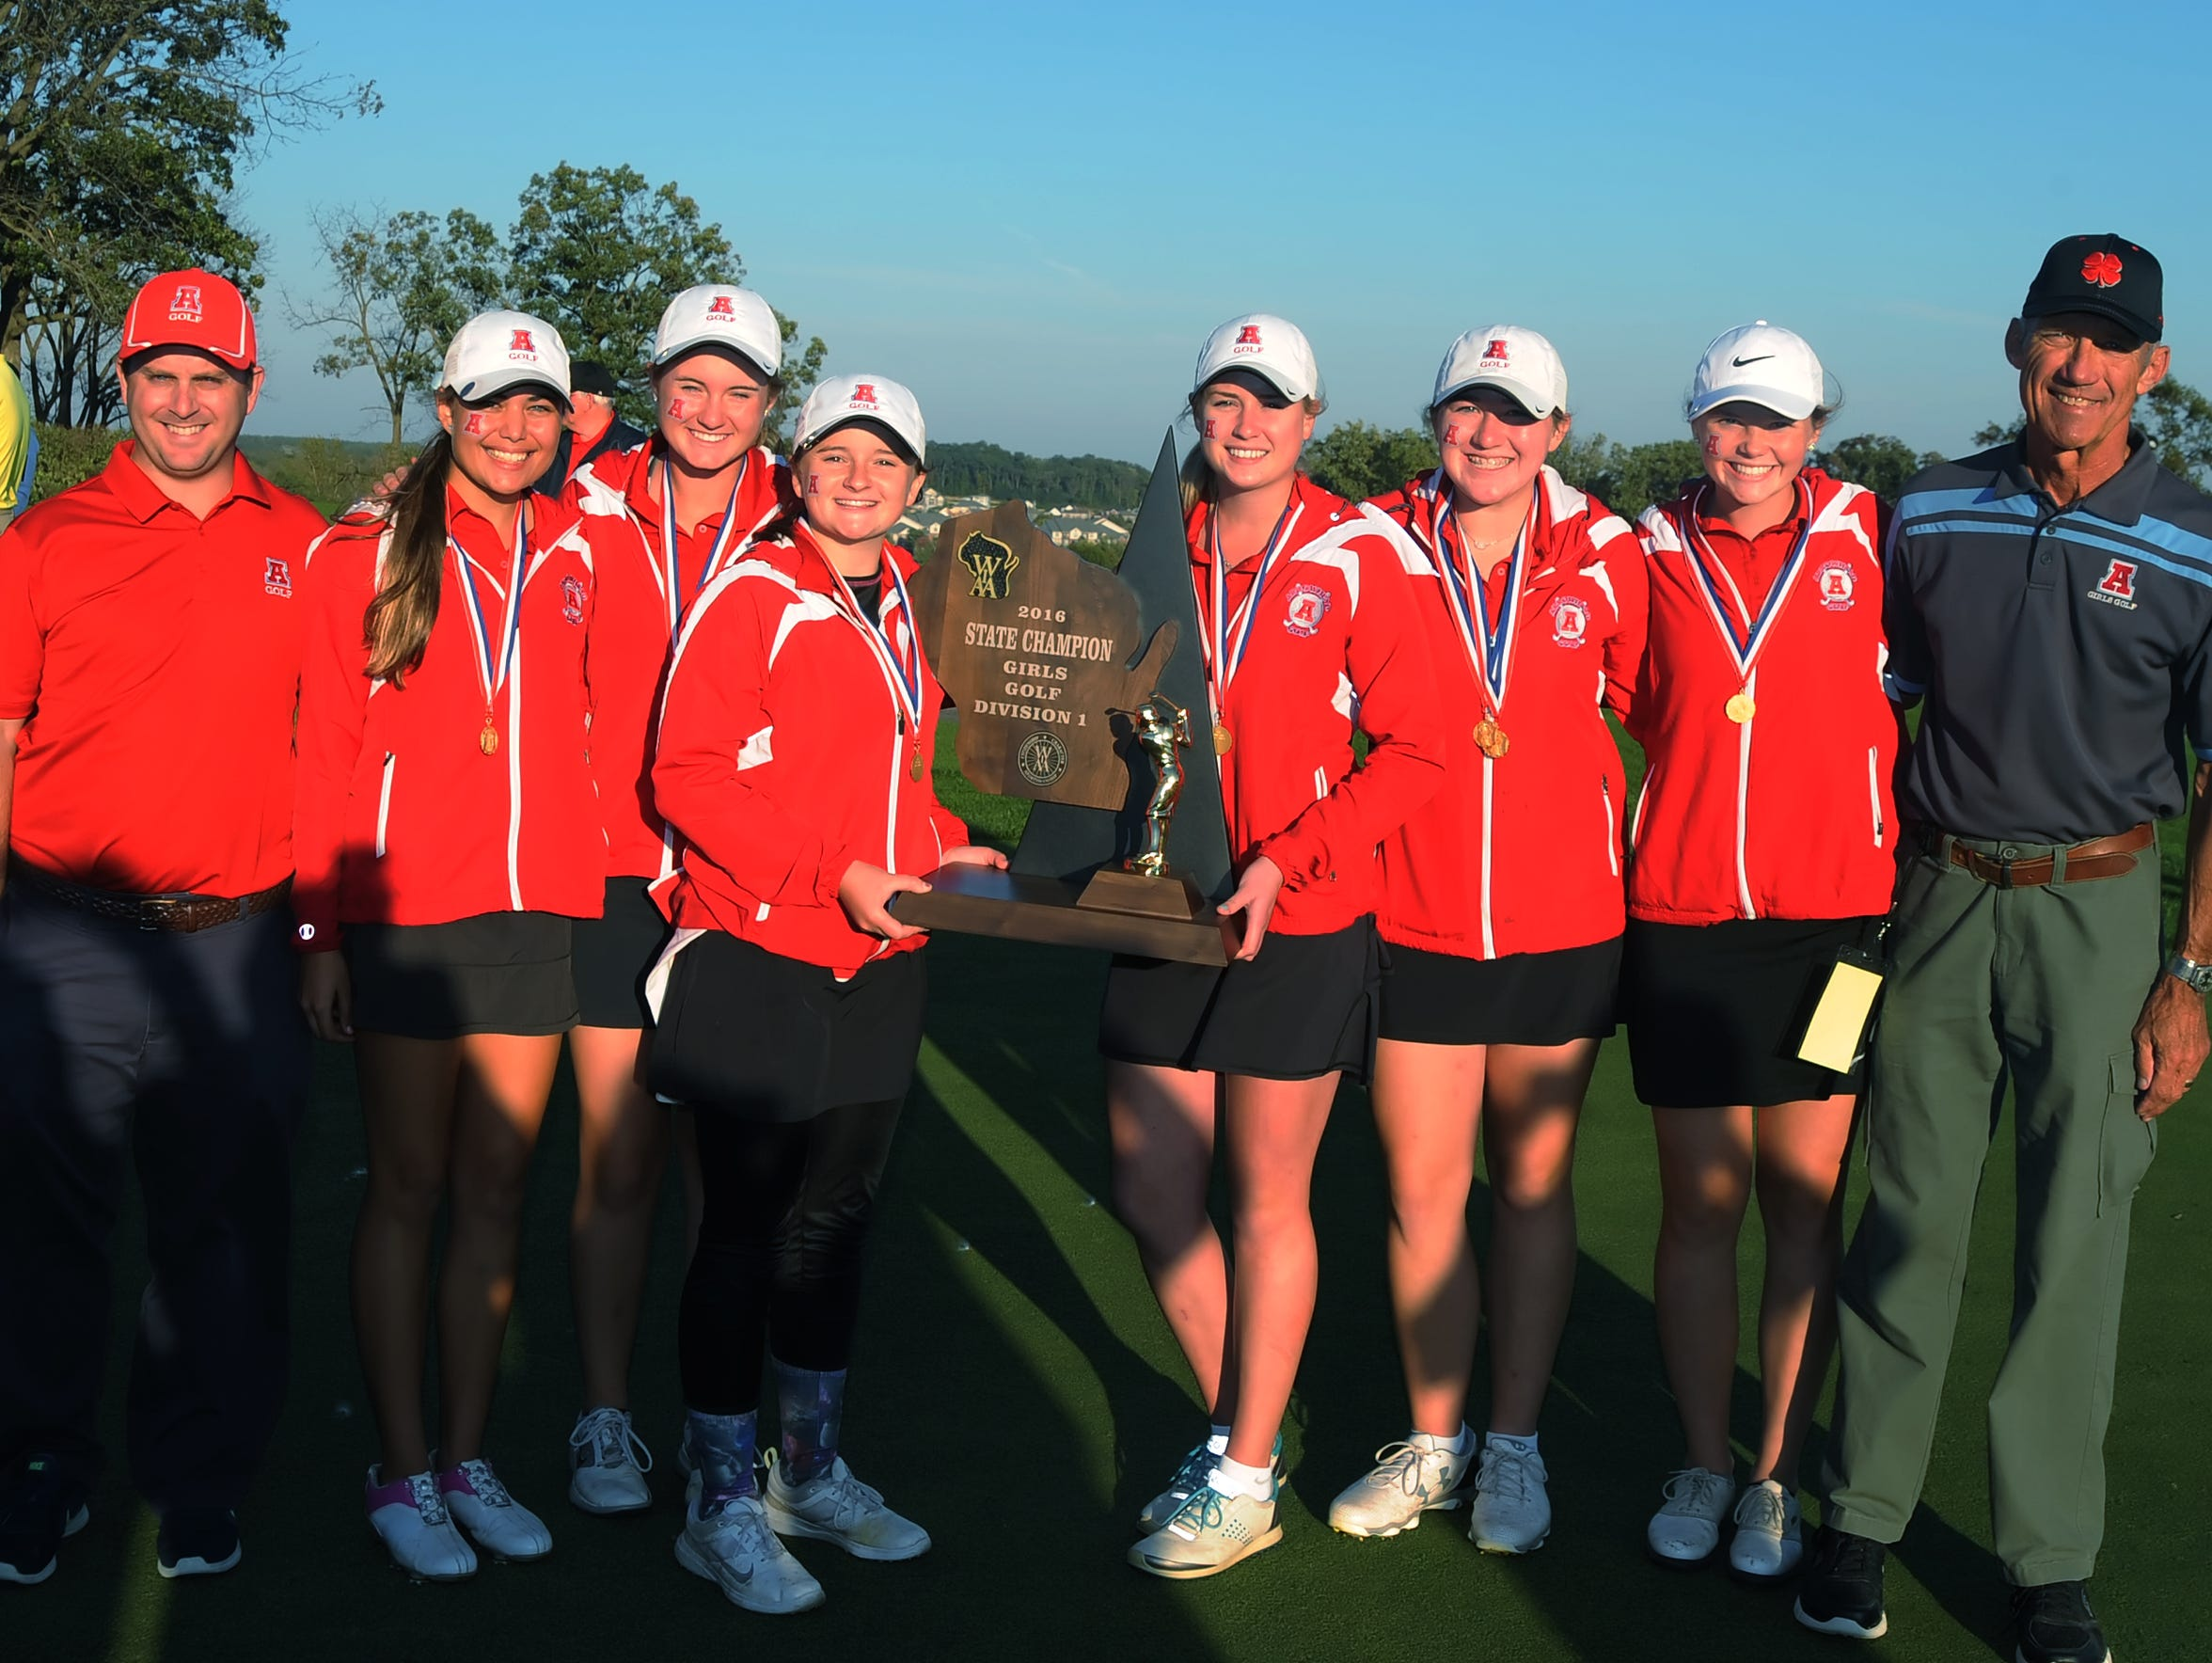 Arrowhead's Division 1 state-championship golf team